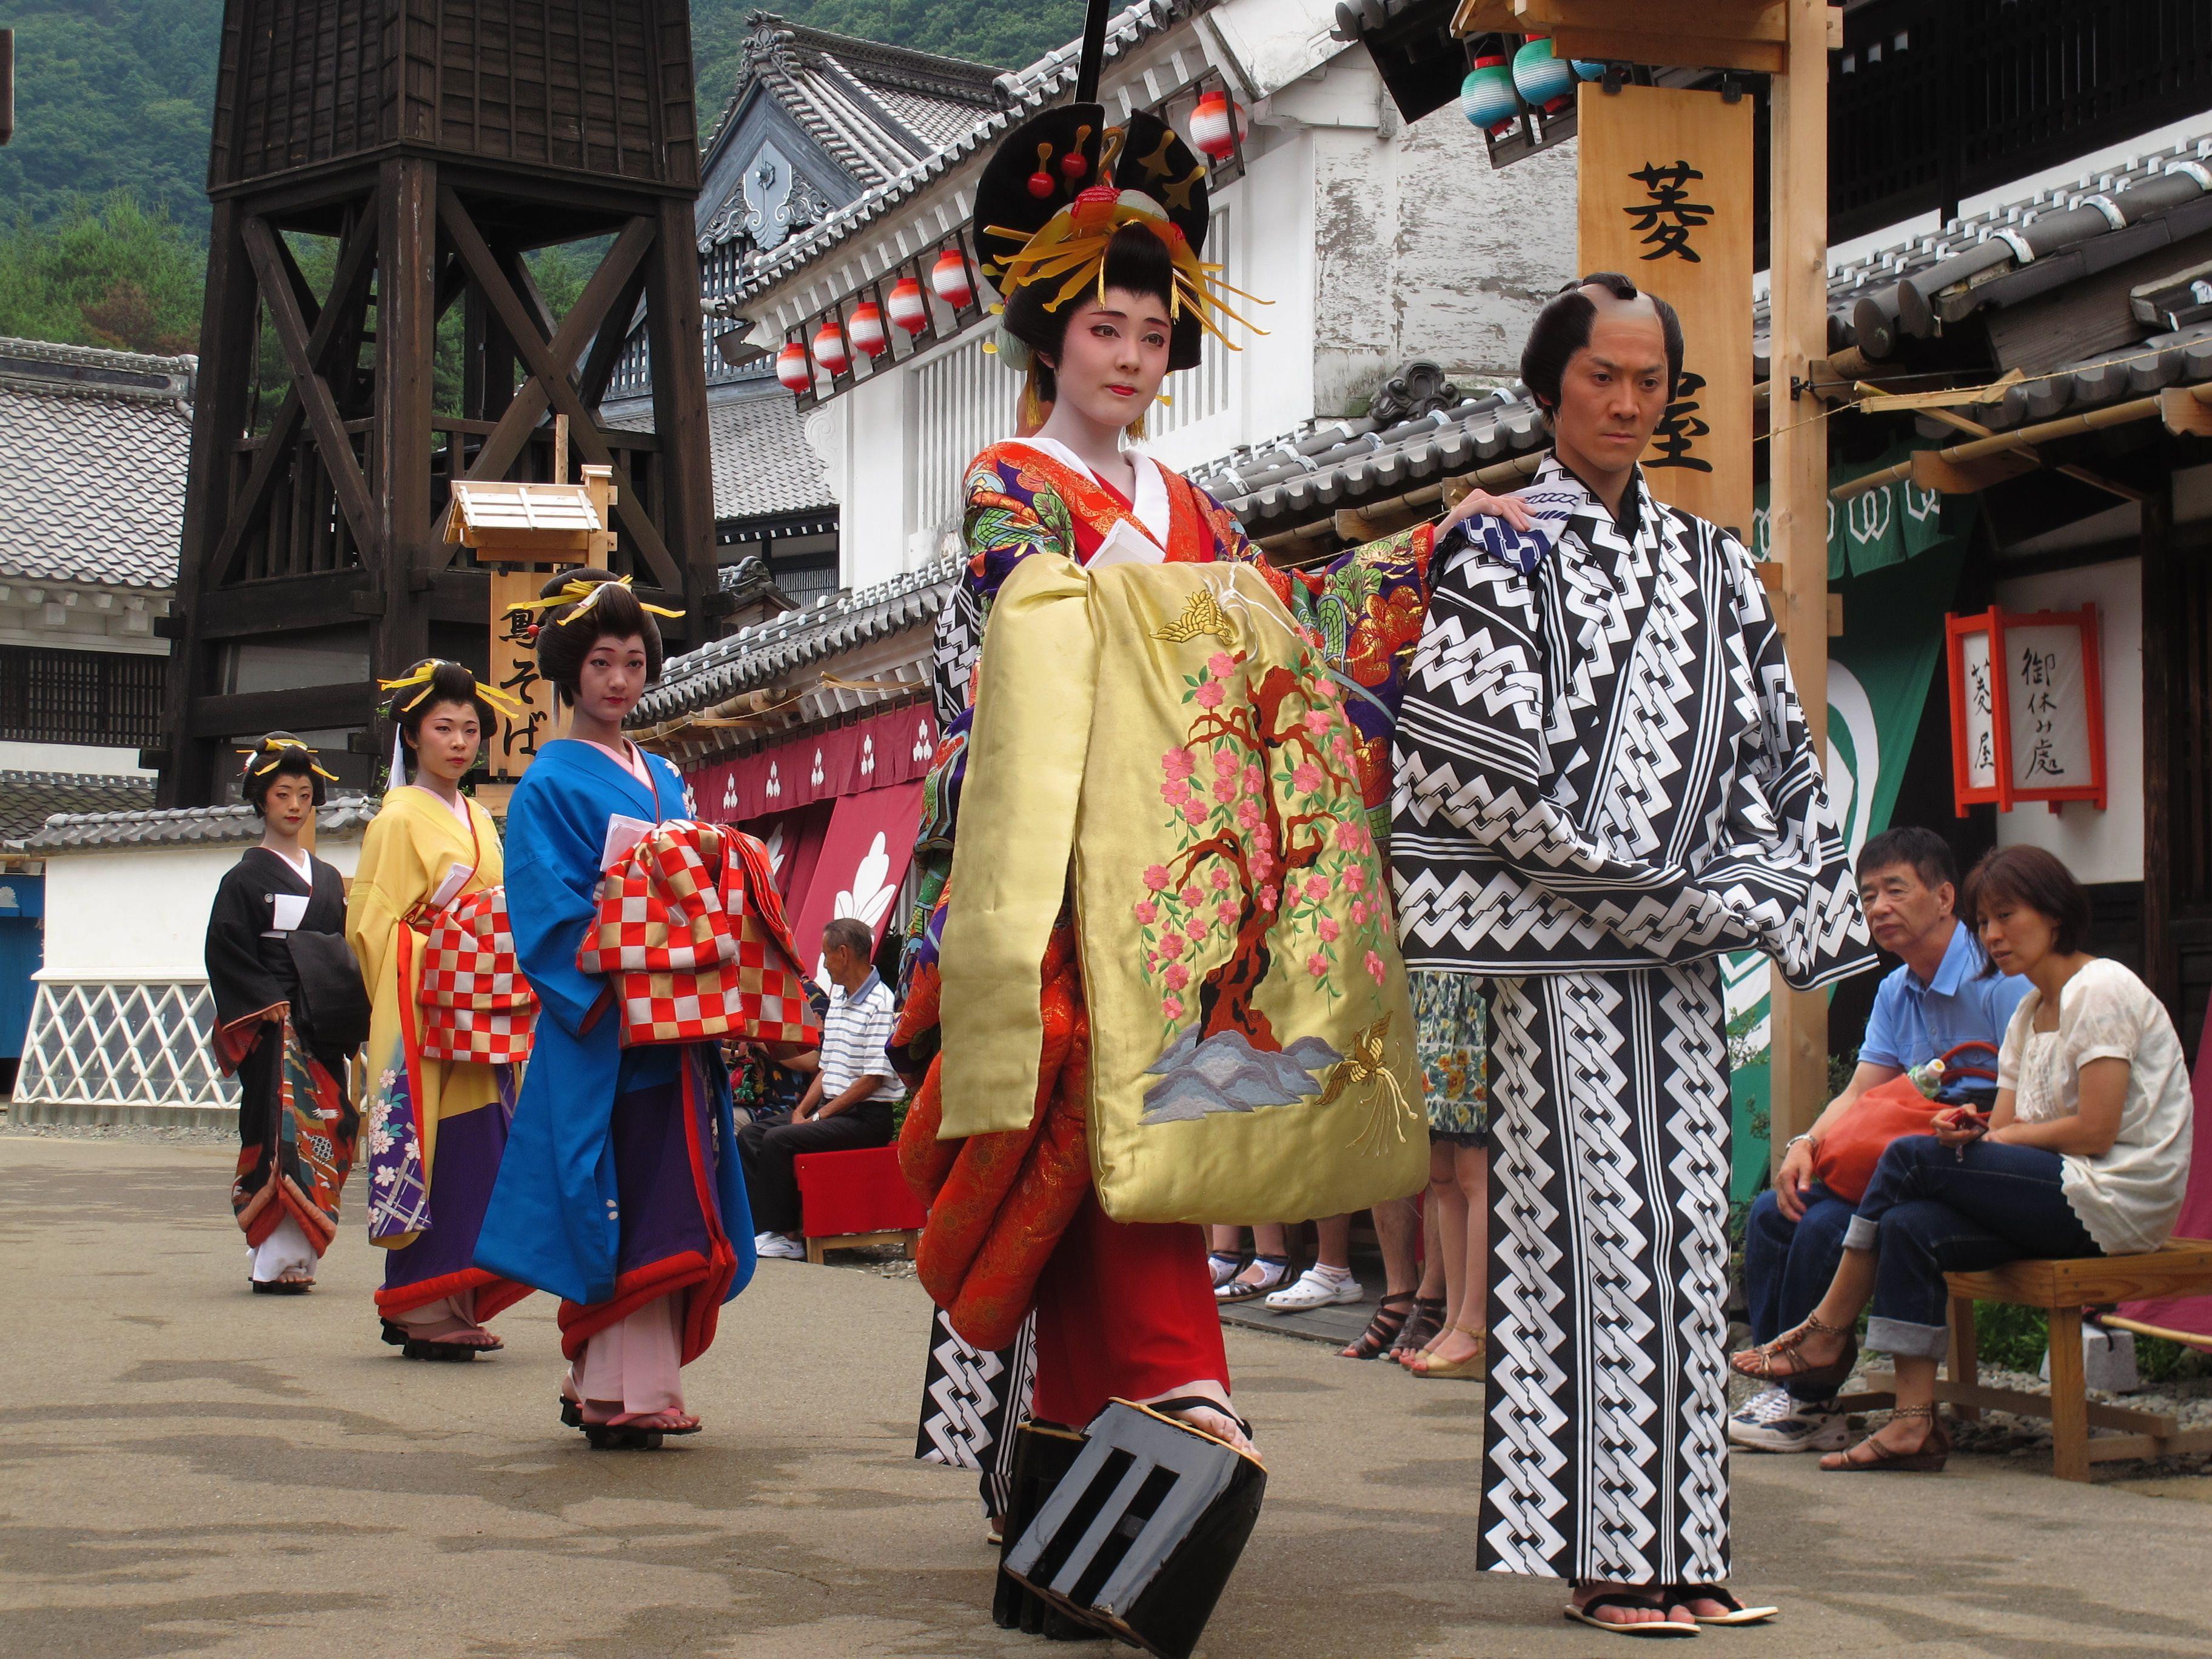 japanese seasonal tradition held - HD3648×2736